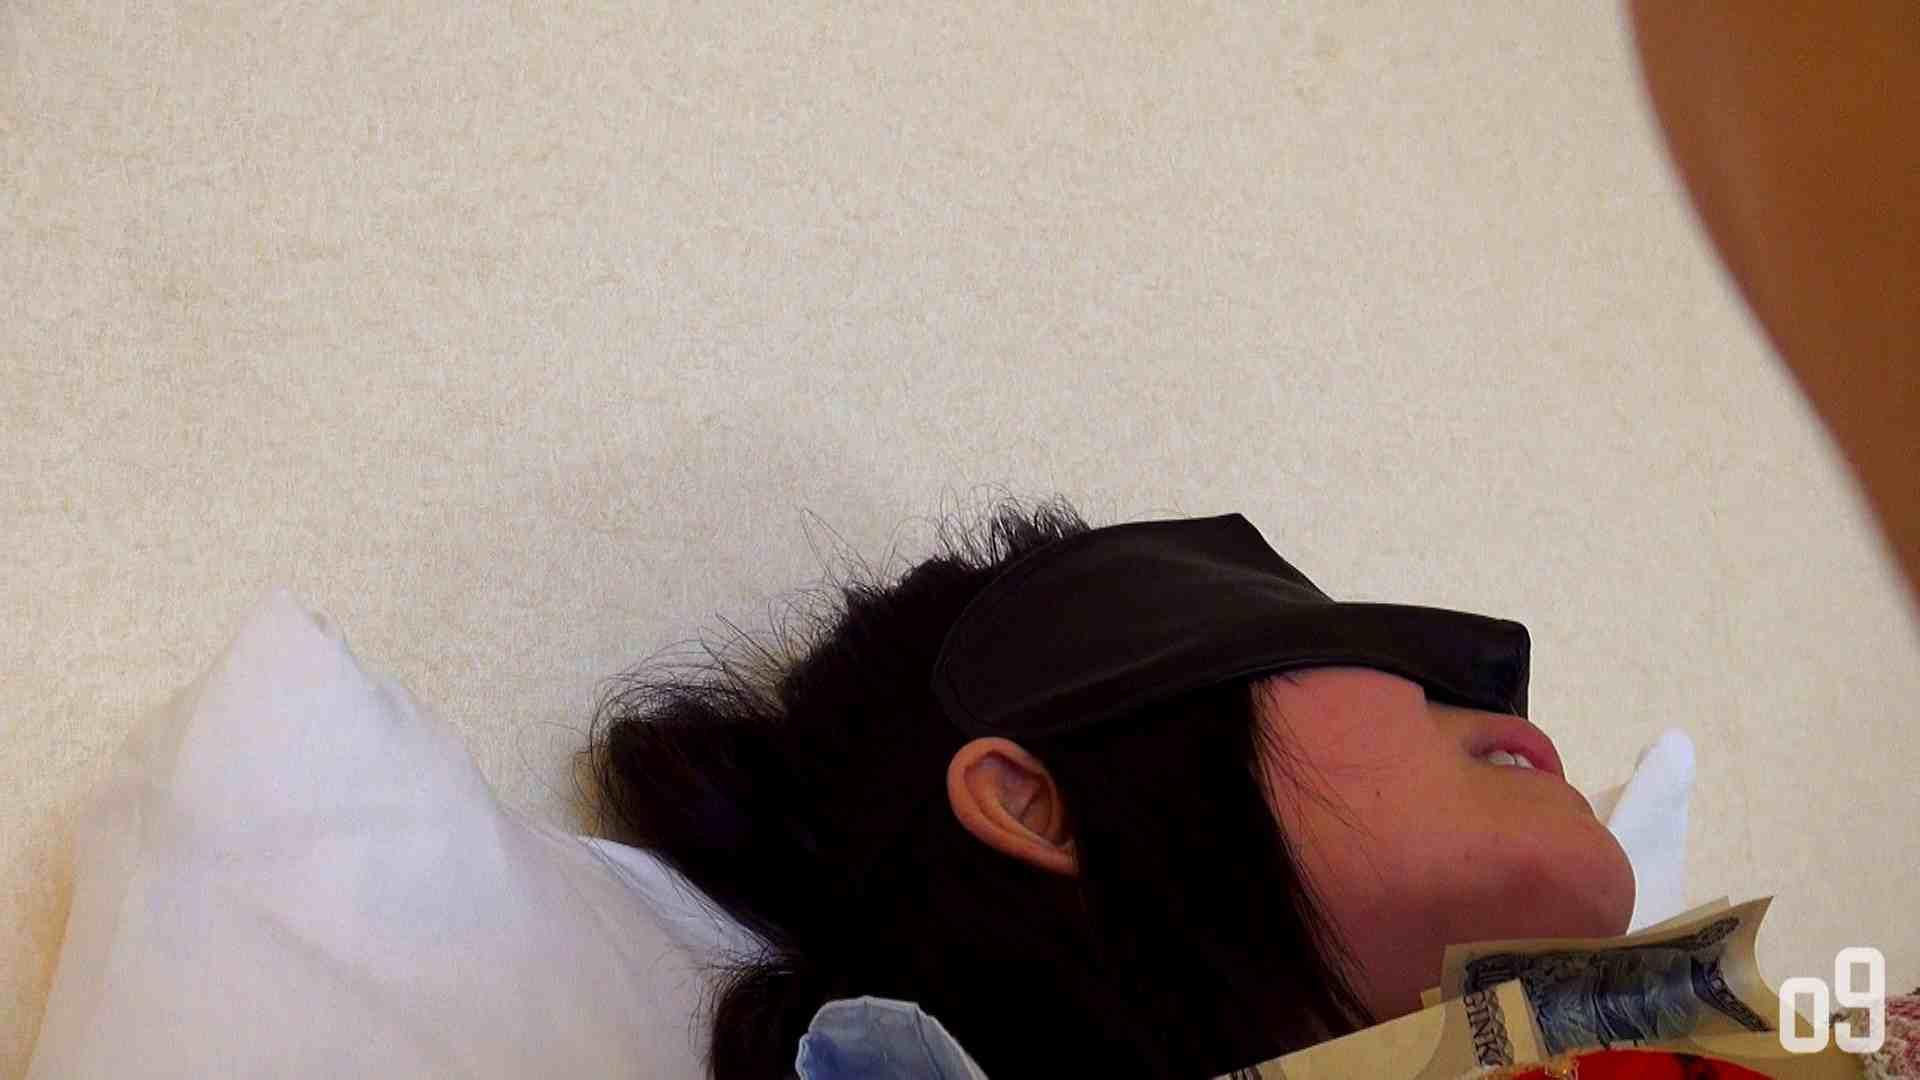 vol.6 TKSさんが震える!留華ちゃんの不慣れな手コキで念願の射精! 顔出しNG一般女性 | エッチなOL  99pic 25